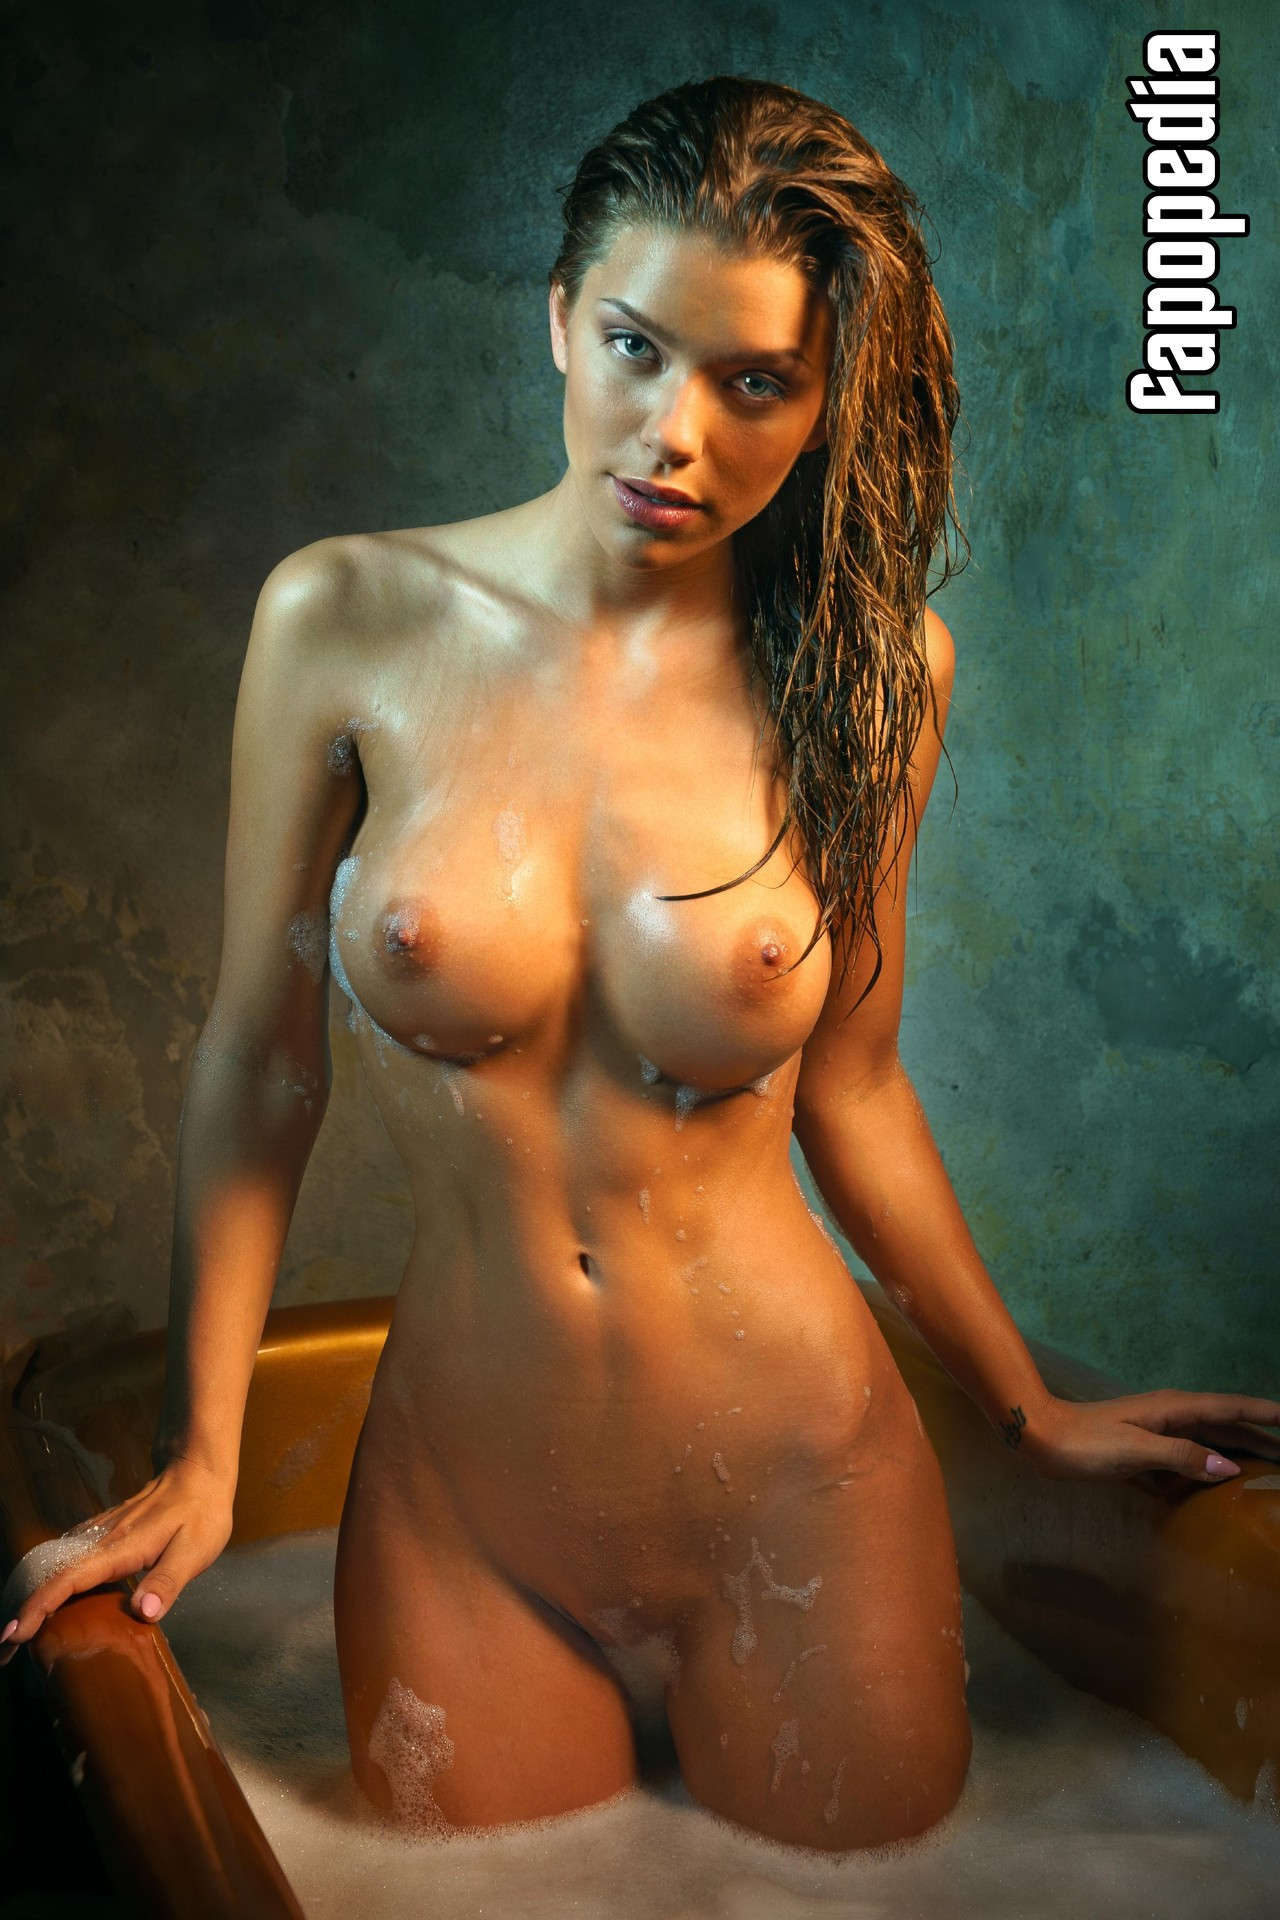 Moonlight_loves_me Nude Leaks